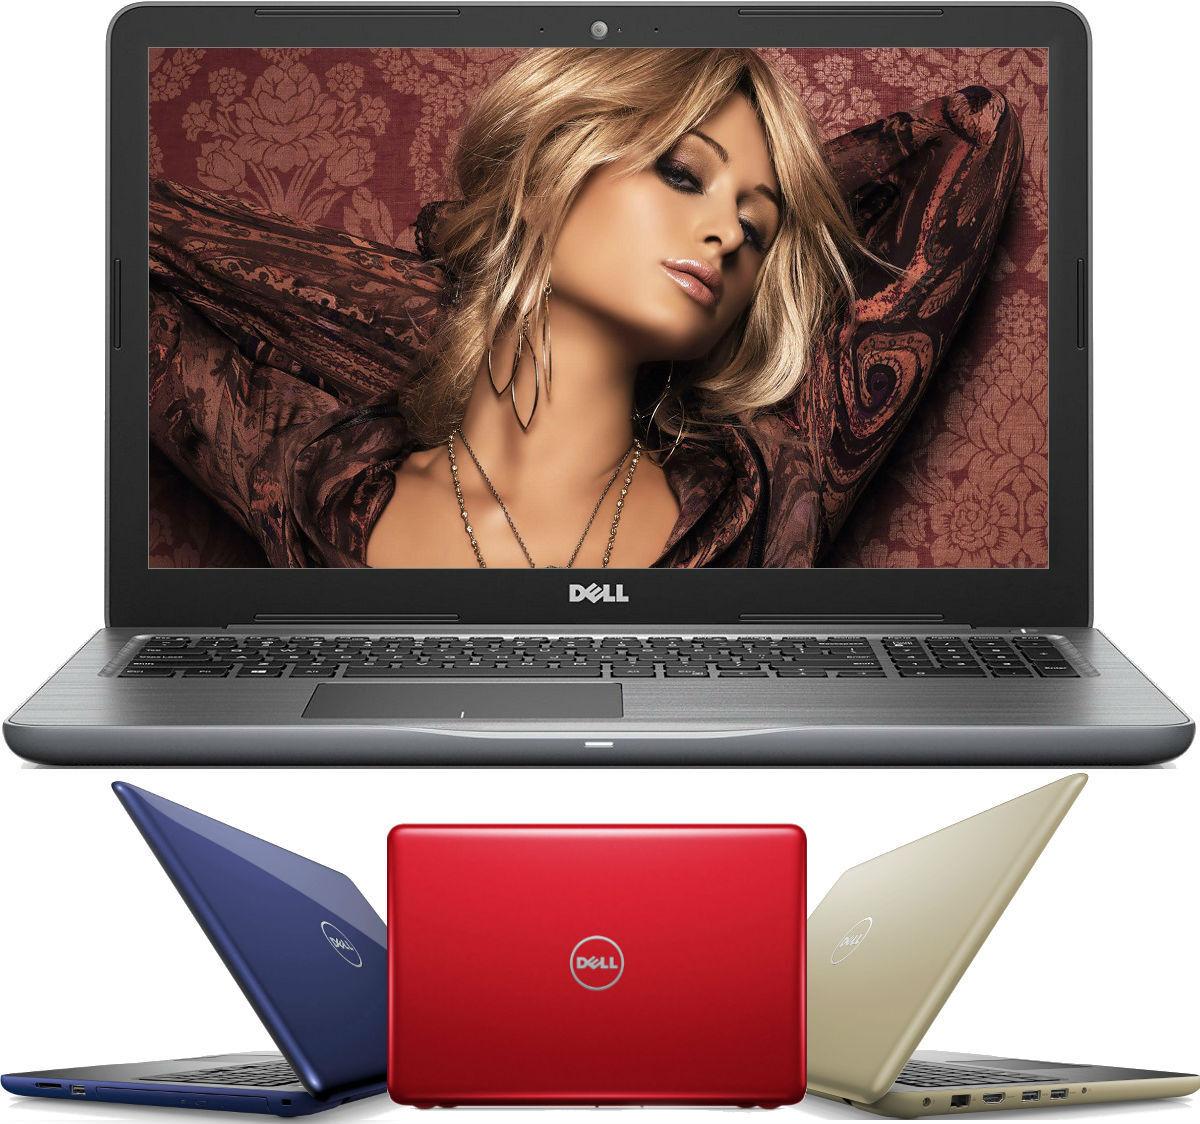 "DELL 17.3"" Gaming Laptop AMD FX-9800P 3.60GHz 8GB 1TB HD DVD+RW Radeon R7 WIN10"